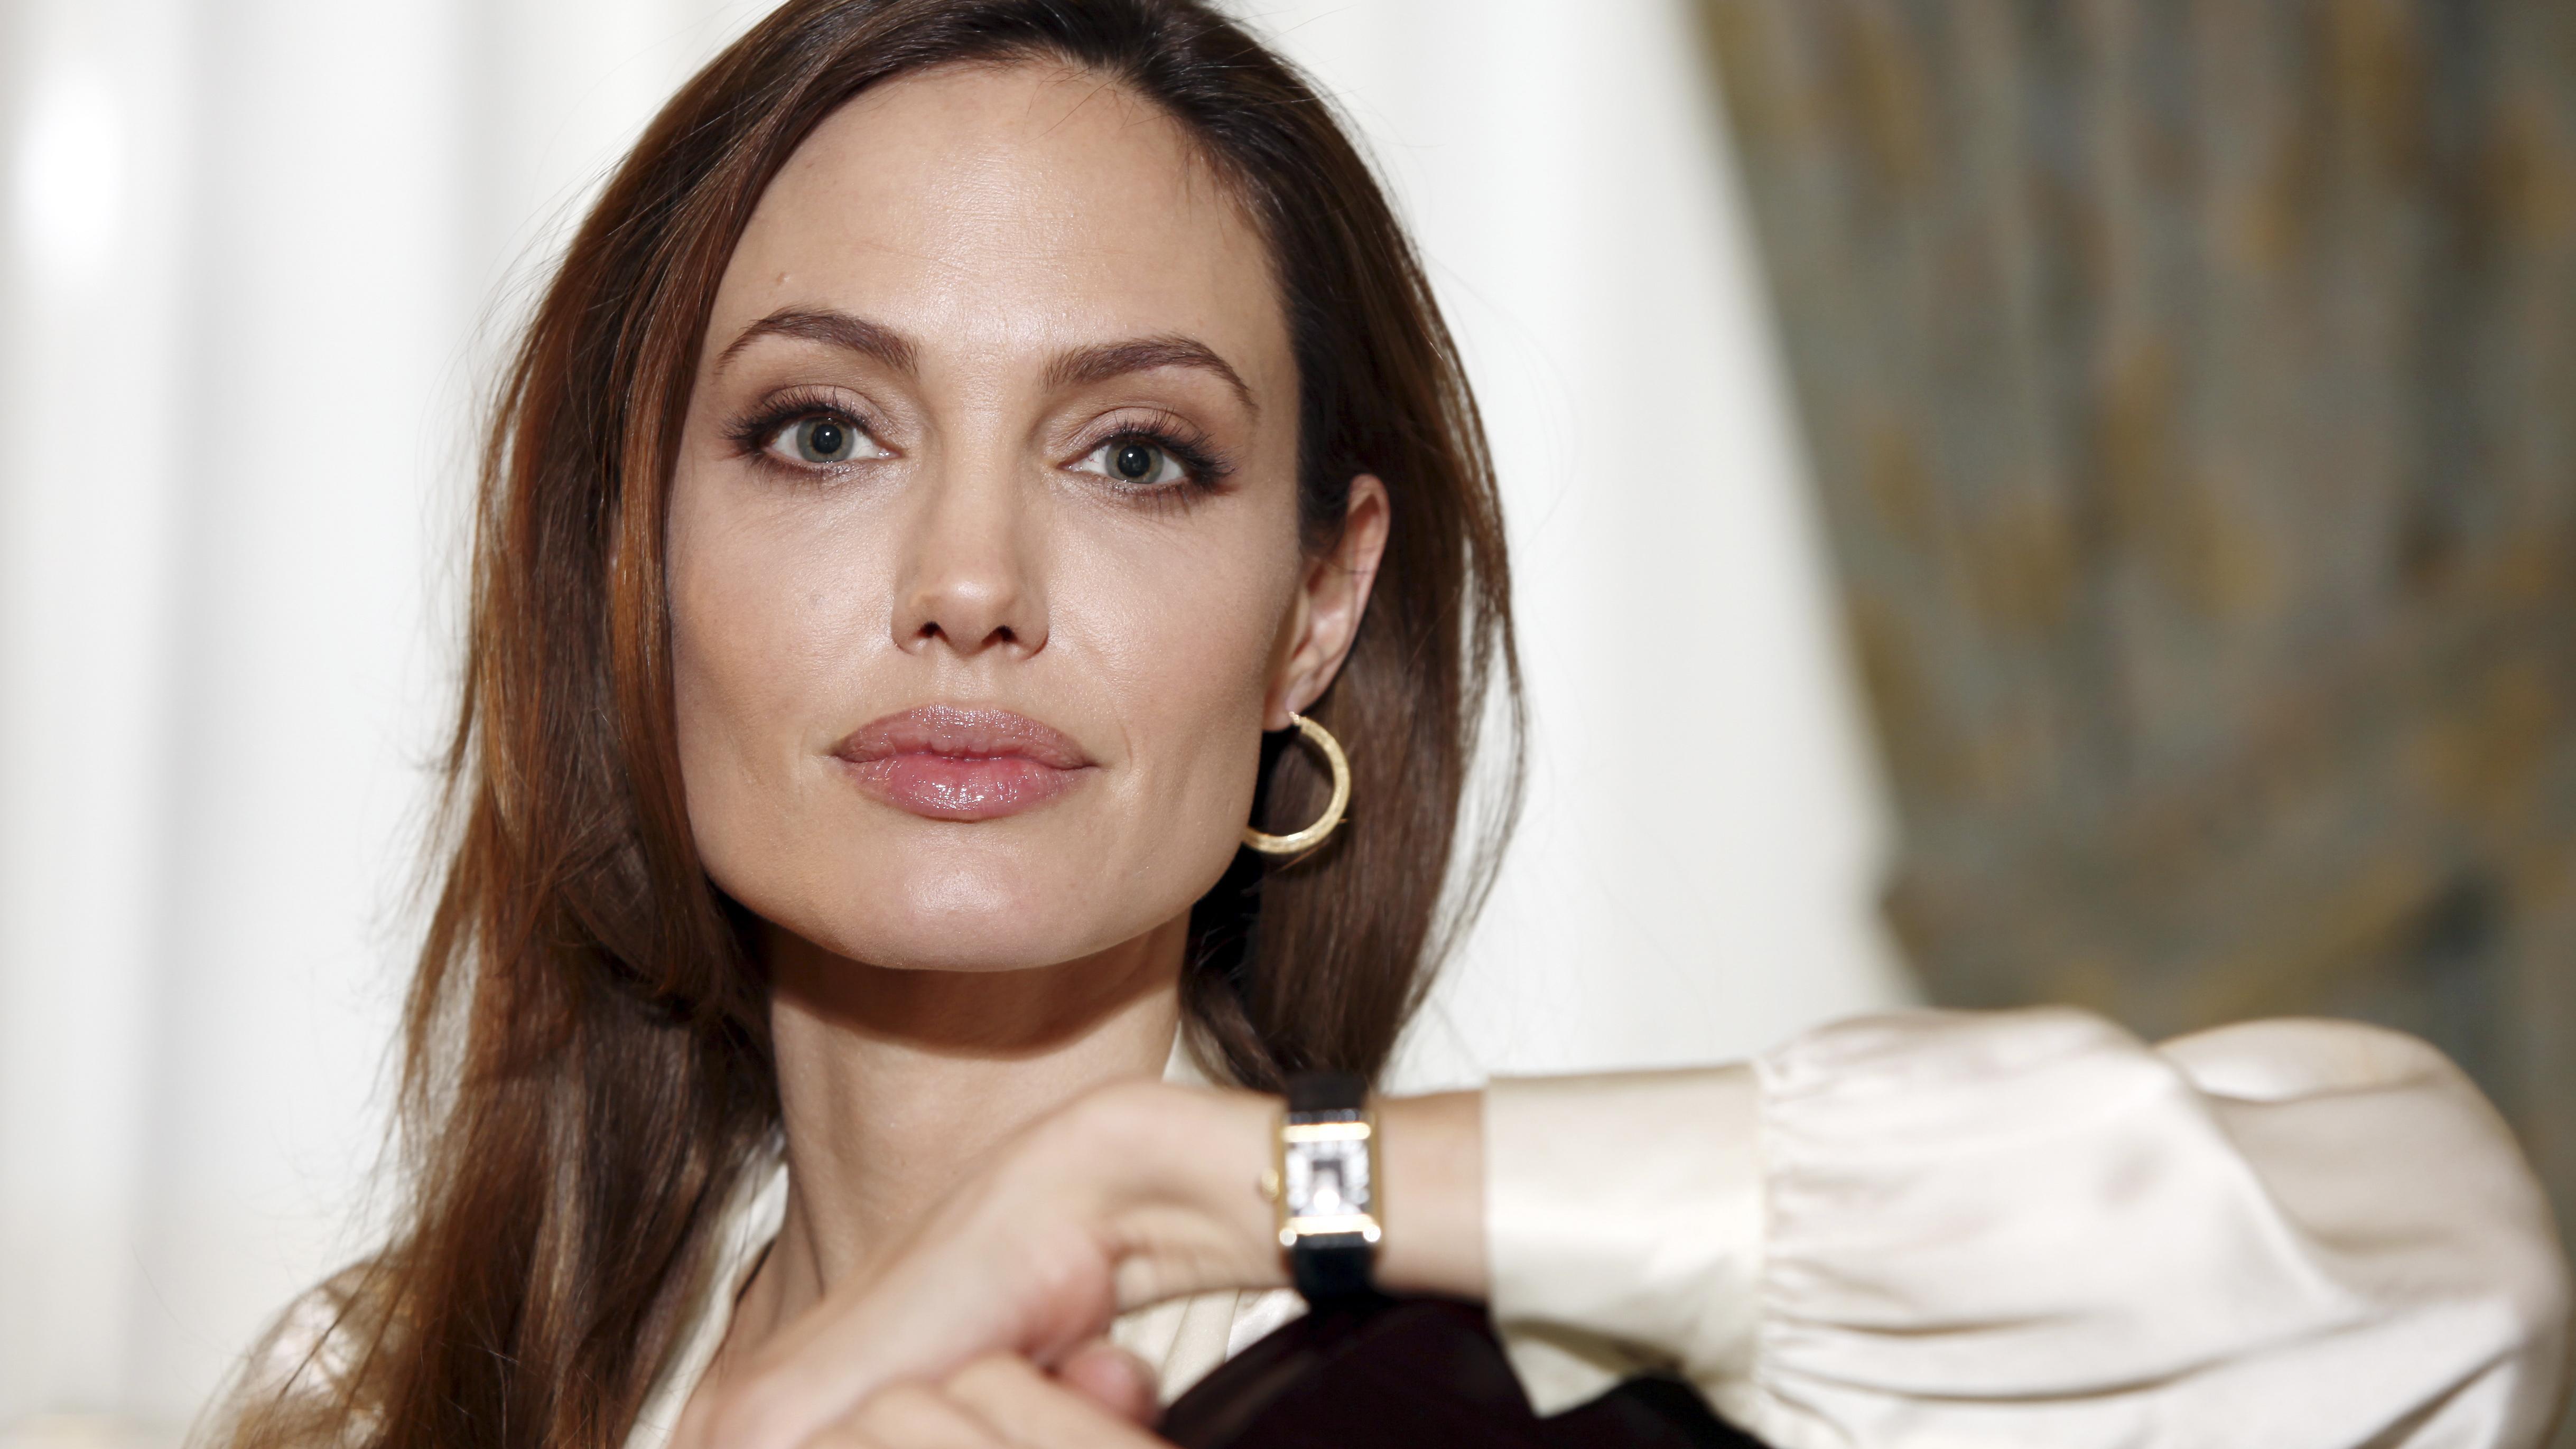 The dark past of Angelina Jolie 06.03.2010 67